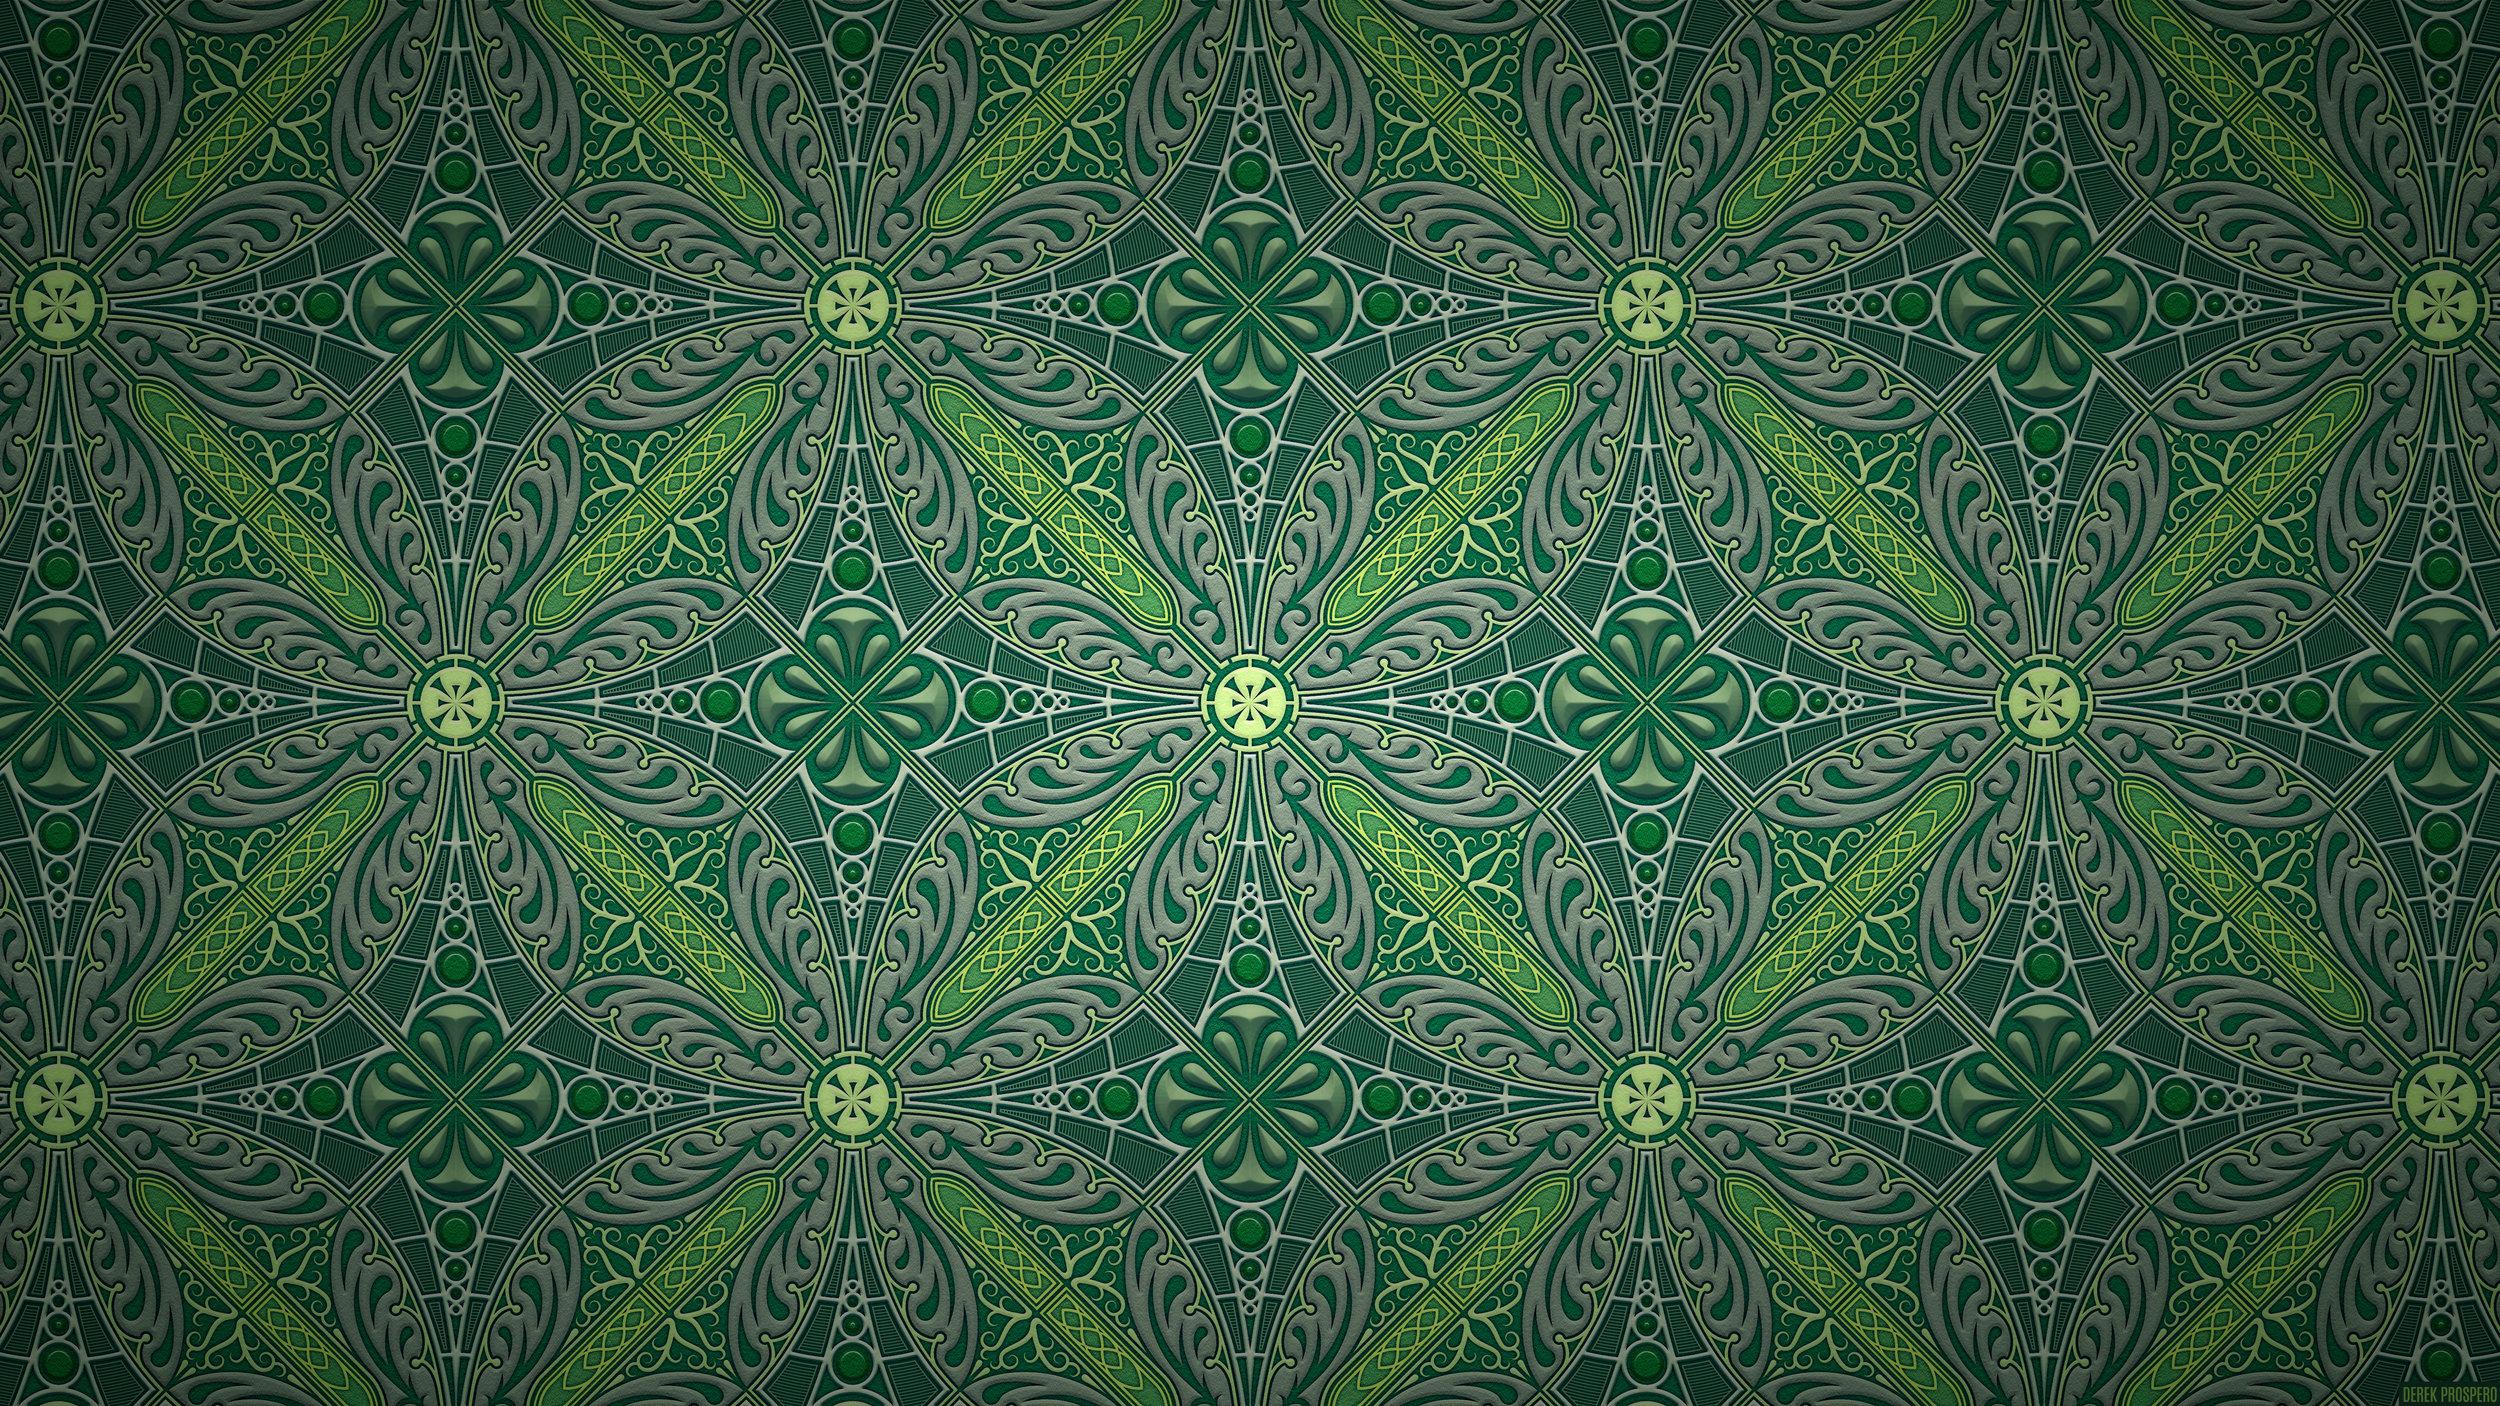 pattern-001.jpg